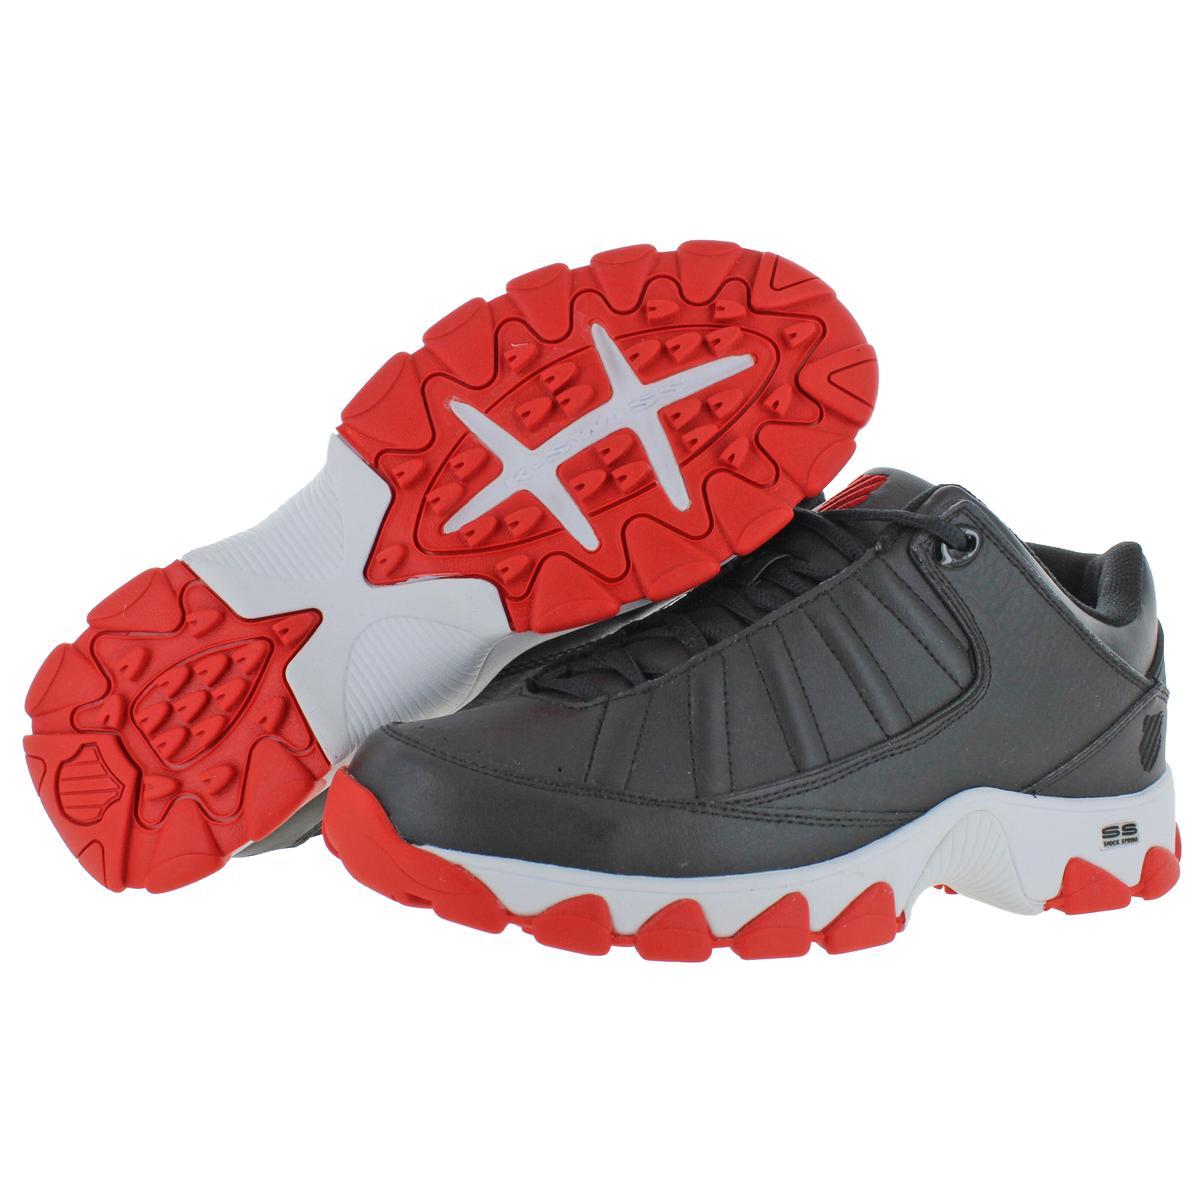 K-Swiss-Men-039-s-ST529-Heritage-Leather-Fashion-Sneakers-Shoes miniatuur 4